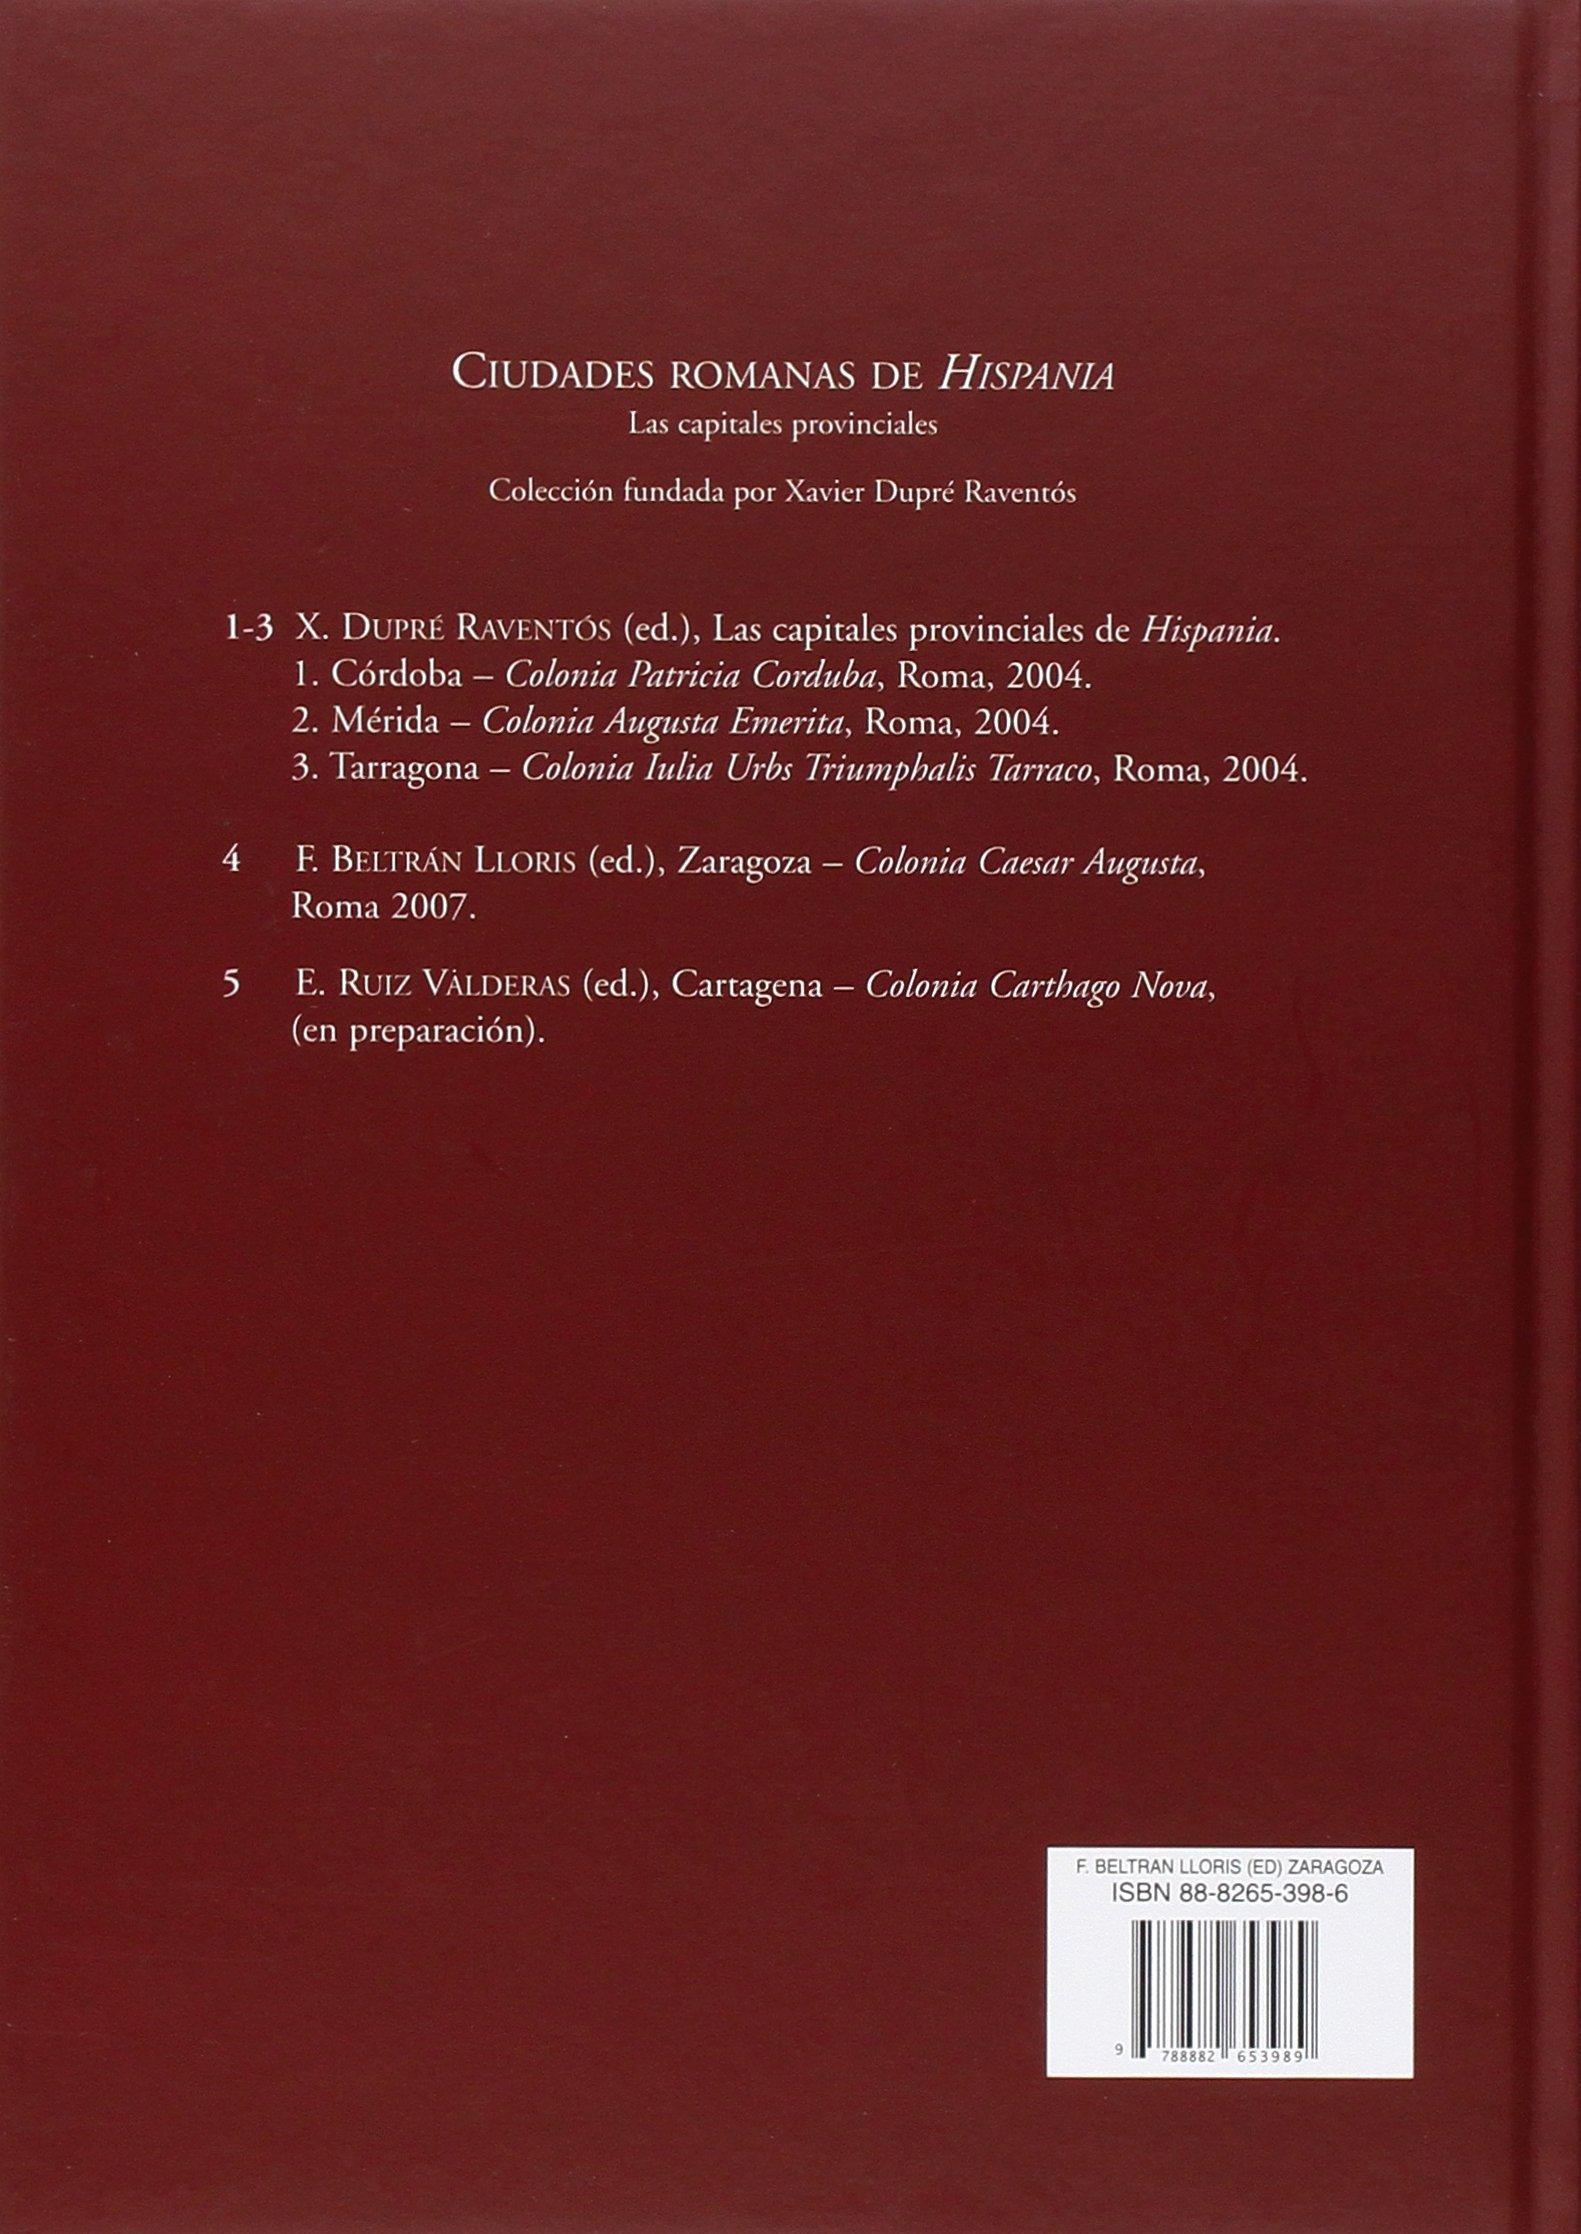 Zaragoza (Ciudades romanas de Hispania): Amazon.es: L. F. Beltrán: Libros en idiomas extranjeros